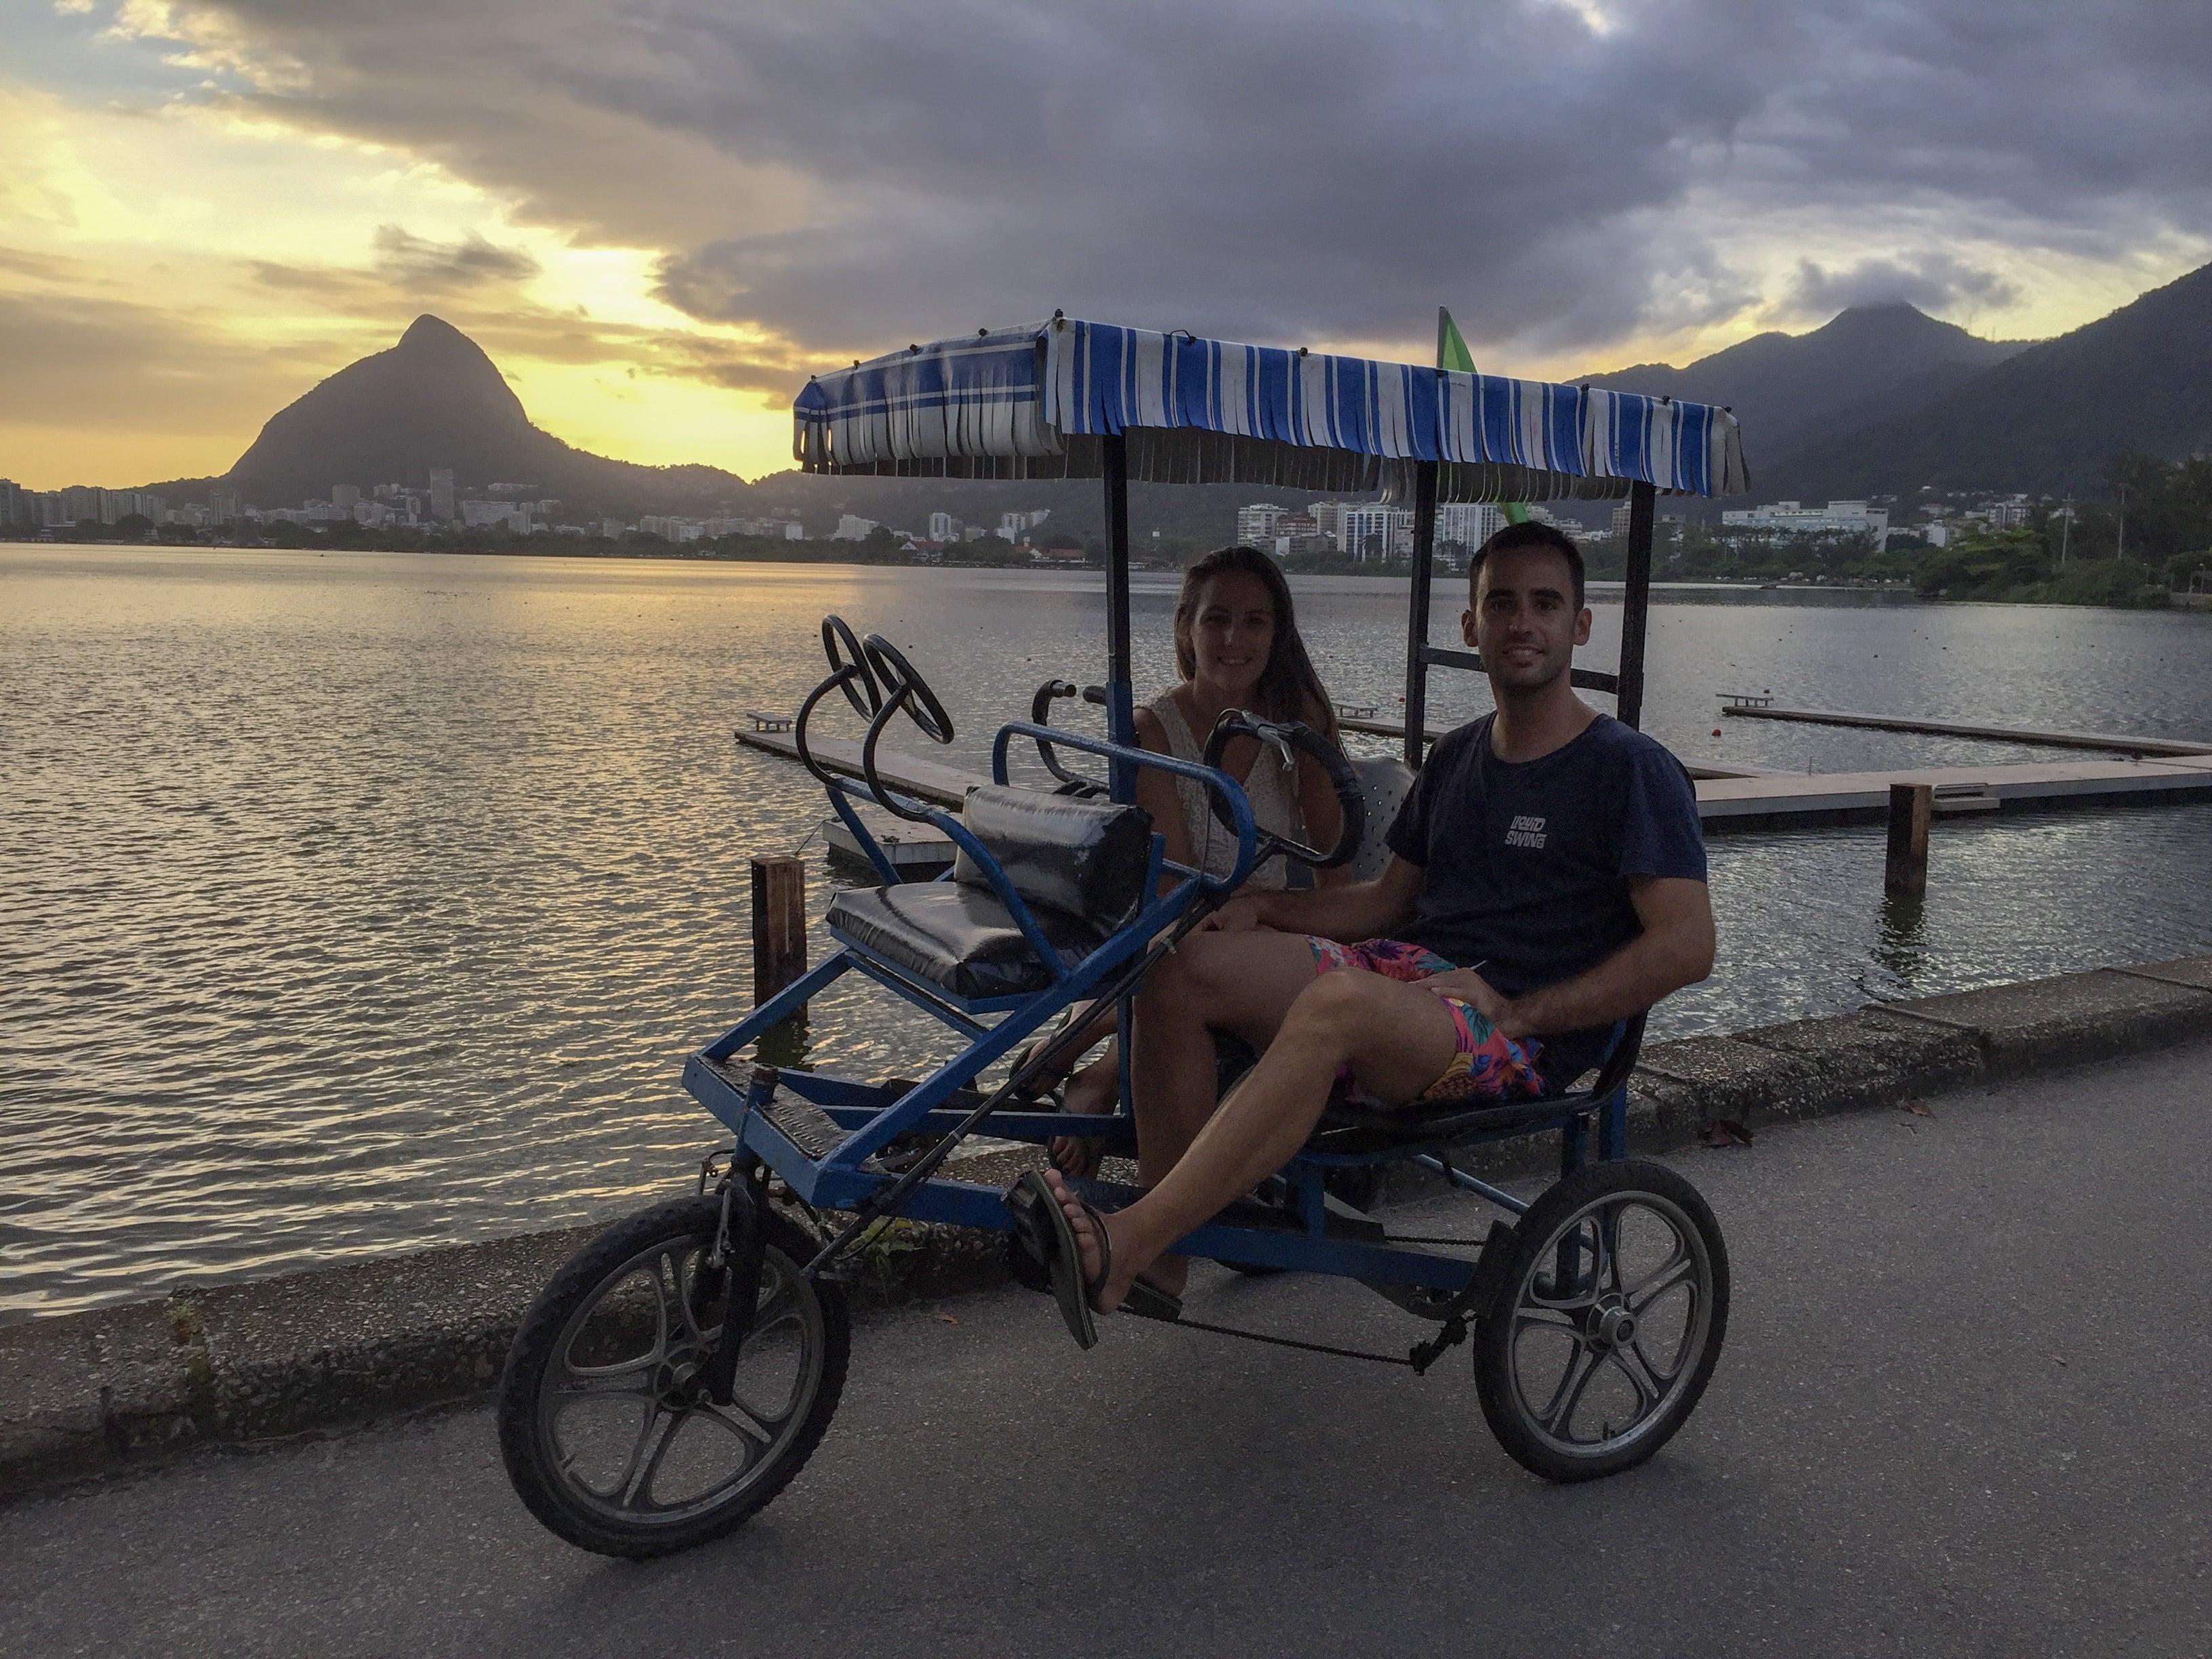 Vuelta en bici al lago Rodrigo de Freitas